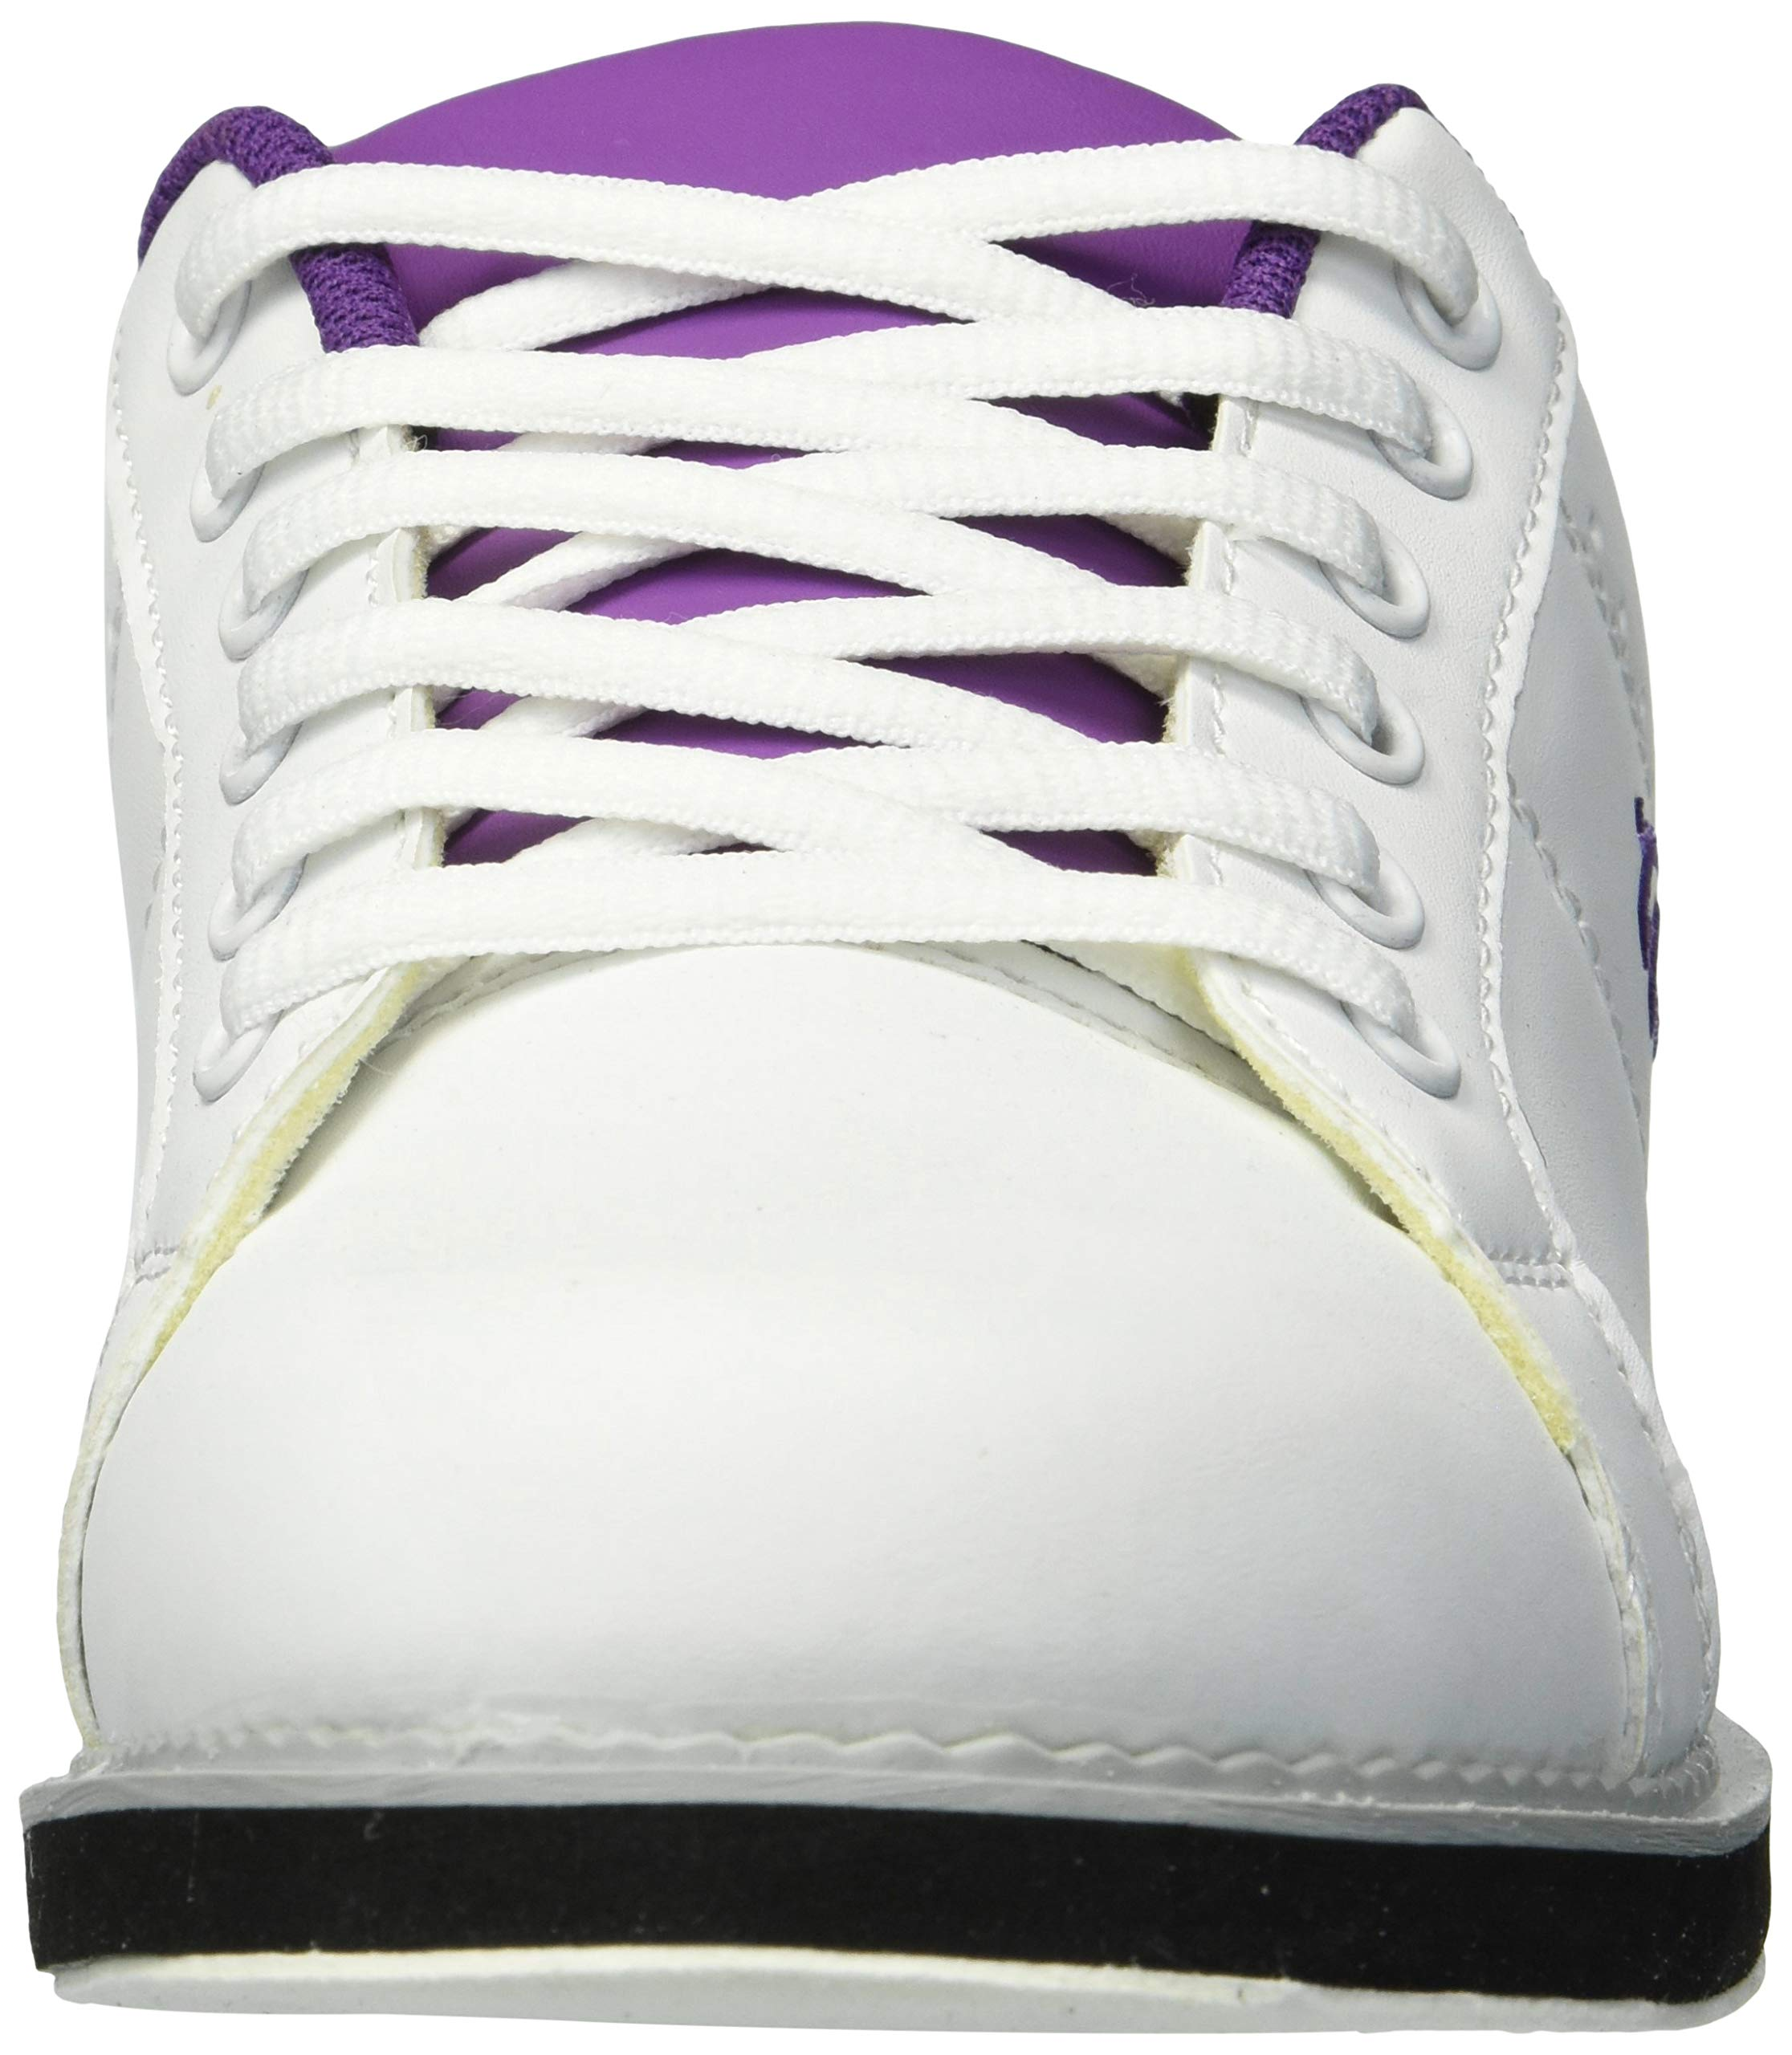 BSI Women's 460 Bowling Shoe, White/Purple, Size 7 by BSI (Image #4)